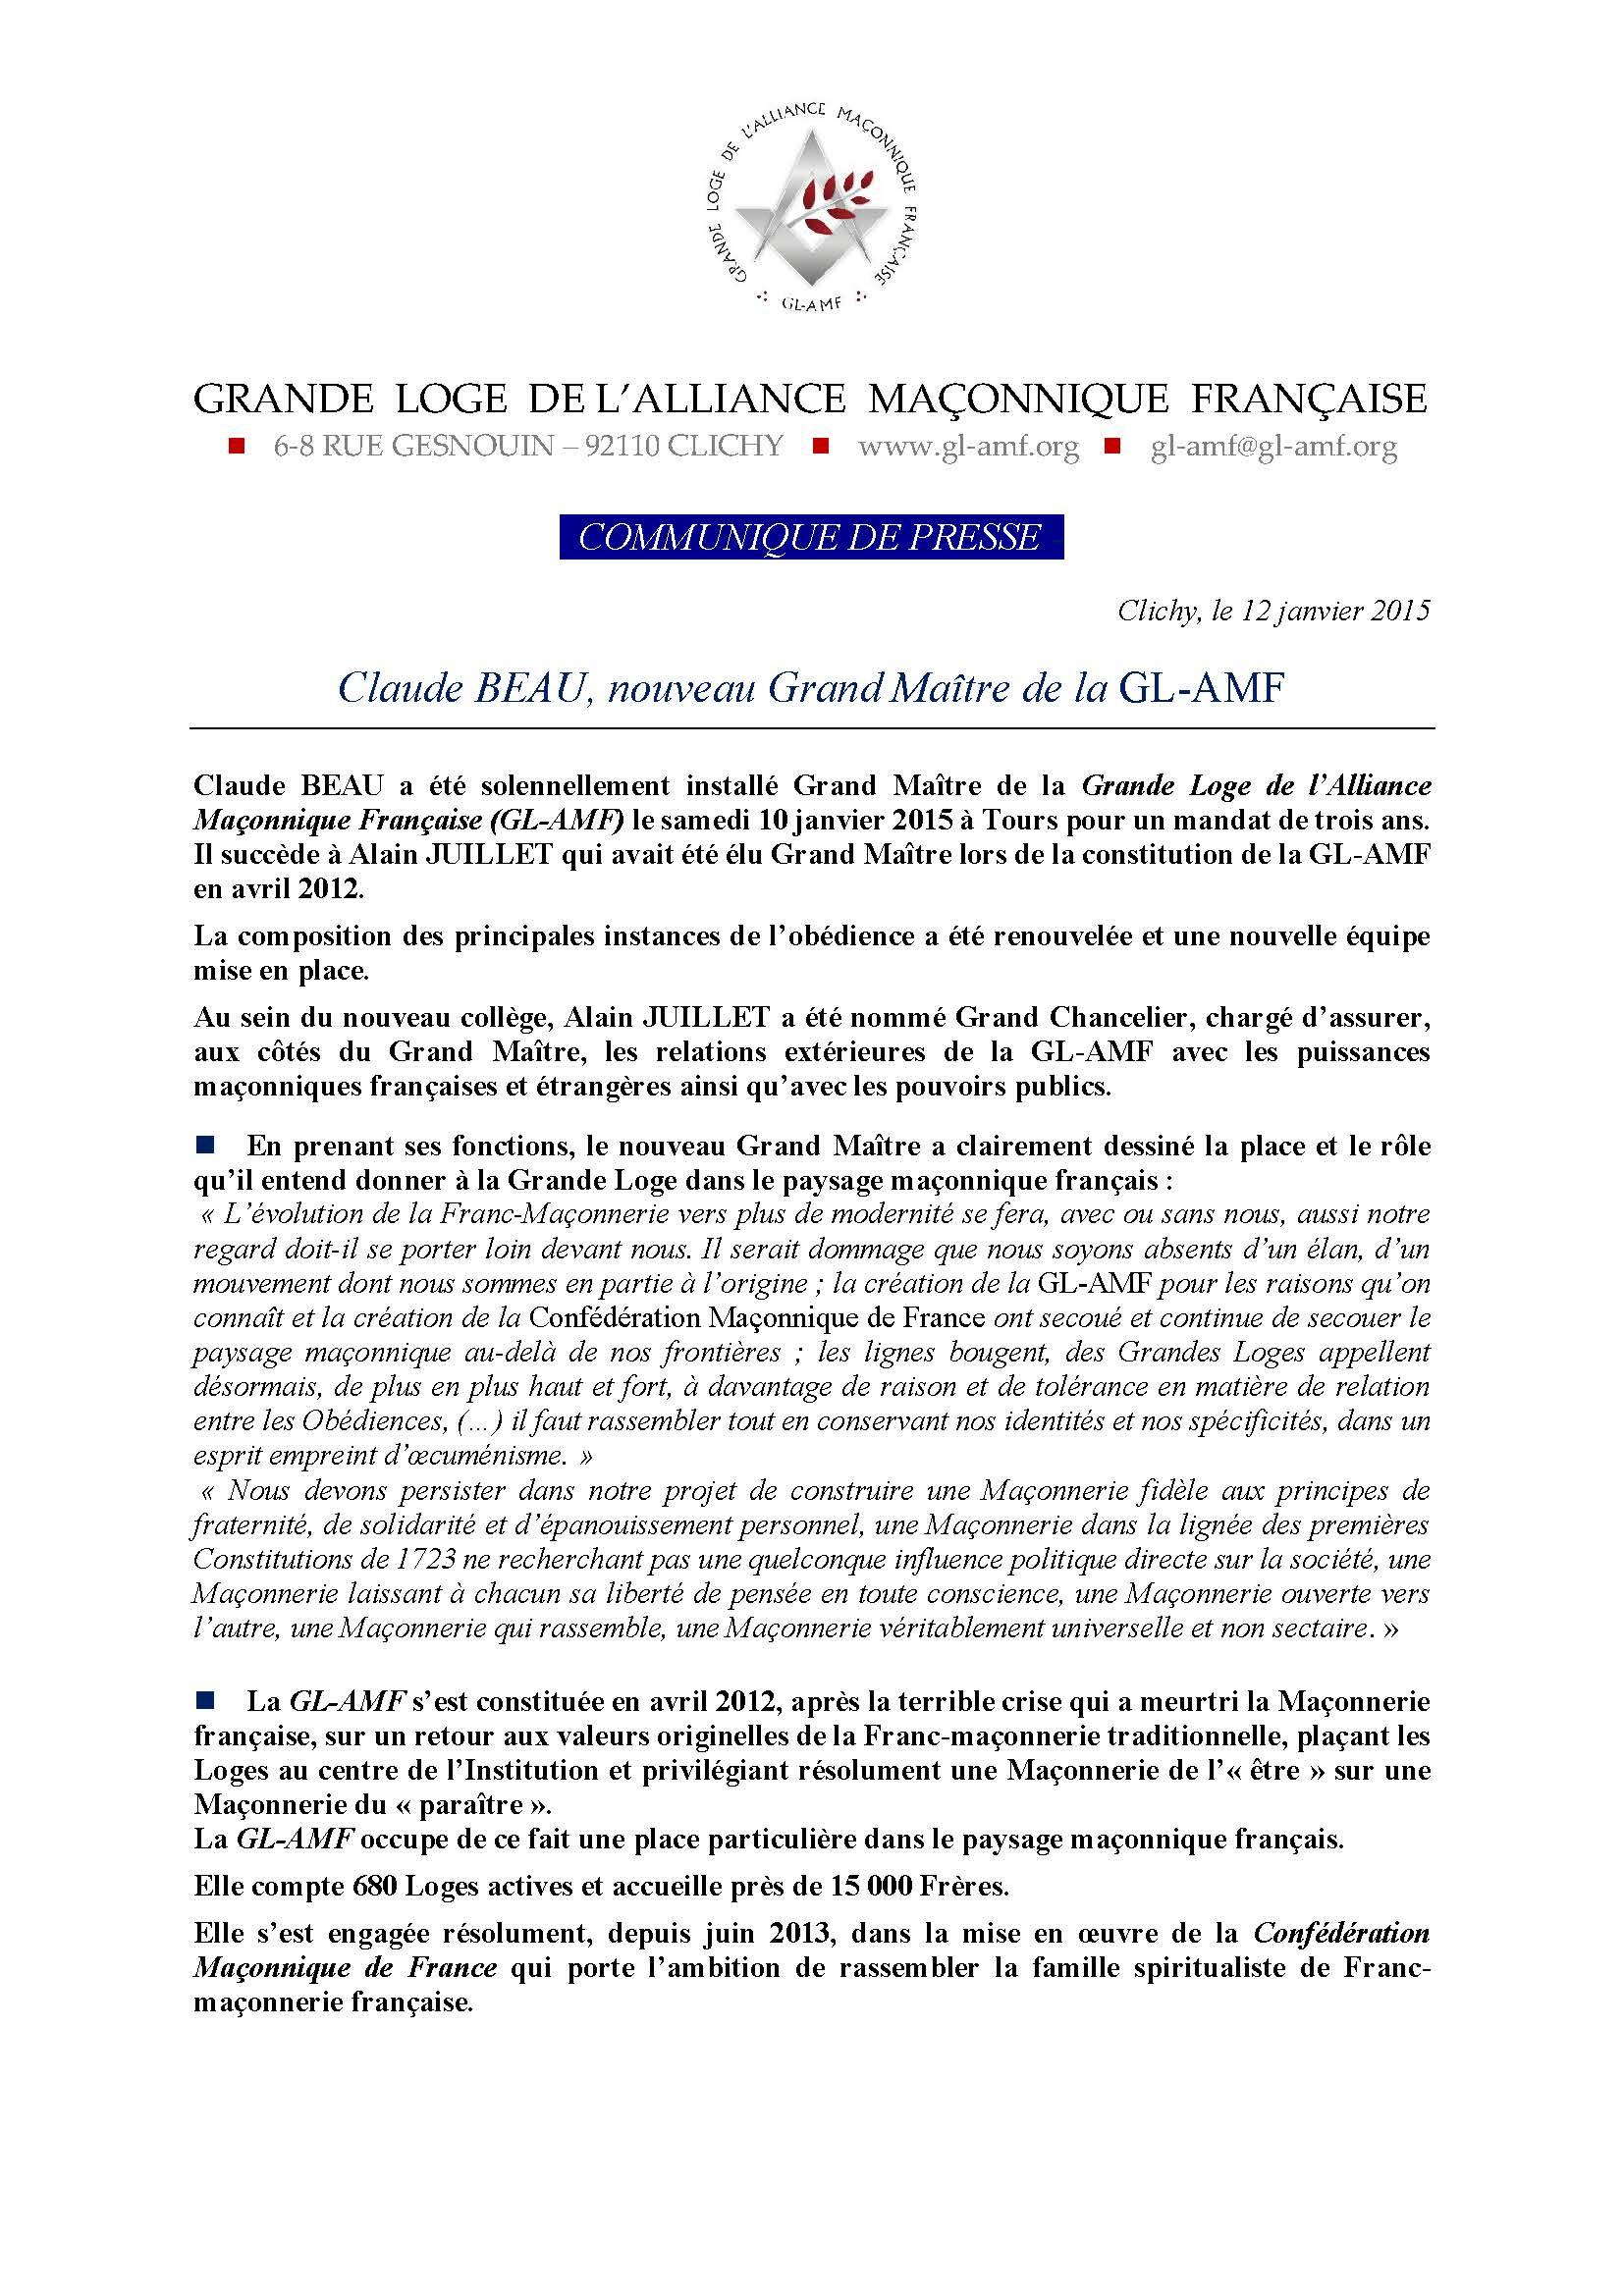 GL-AMF-cque_ -10 jan 2015_Page_1